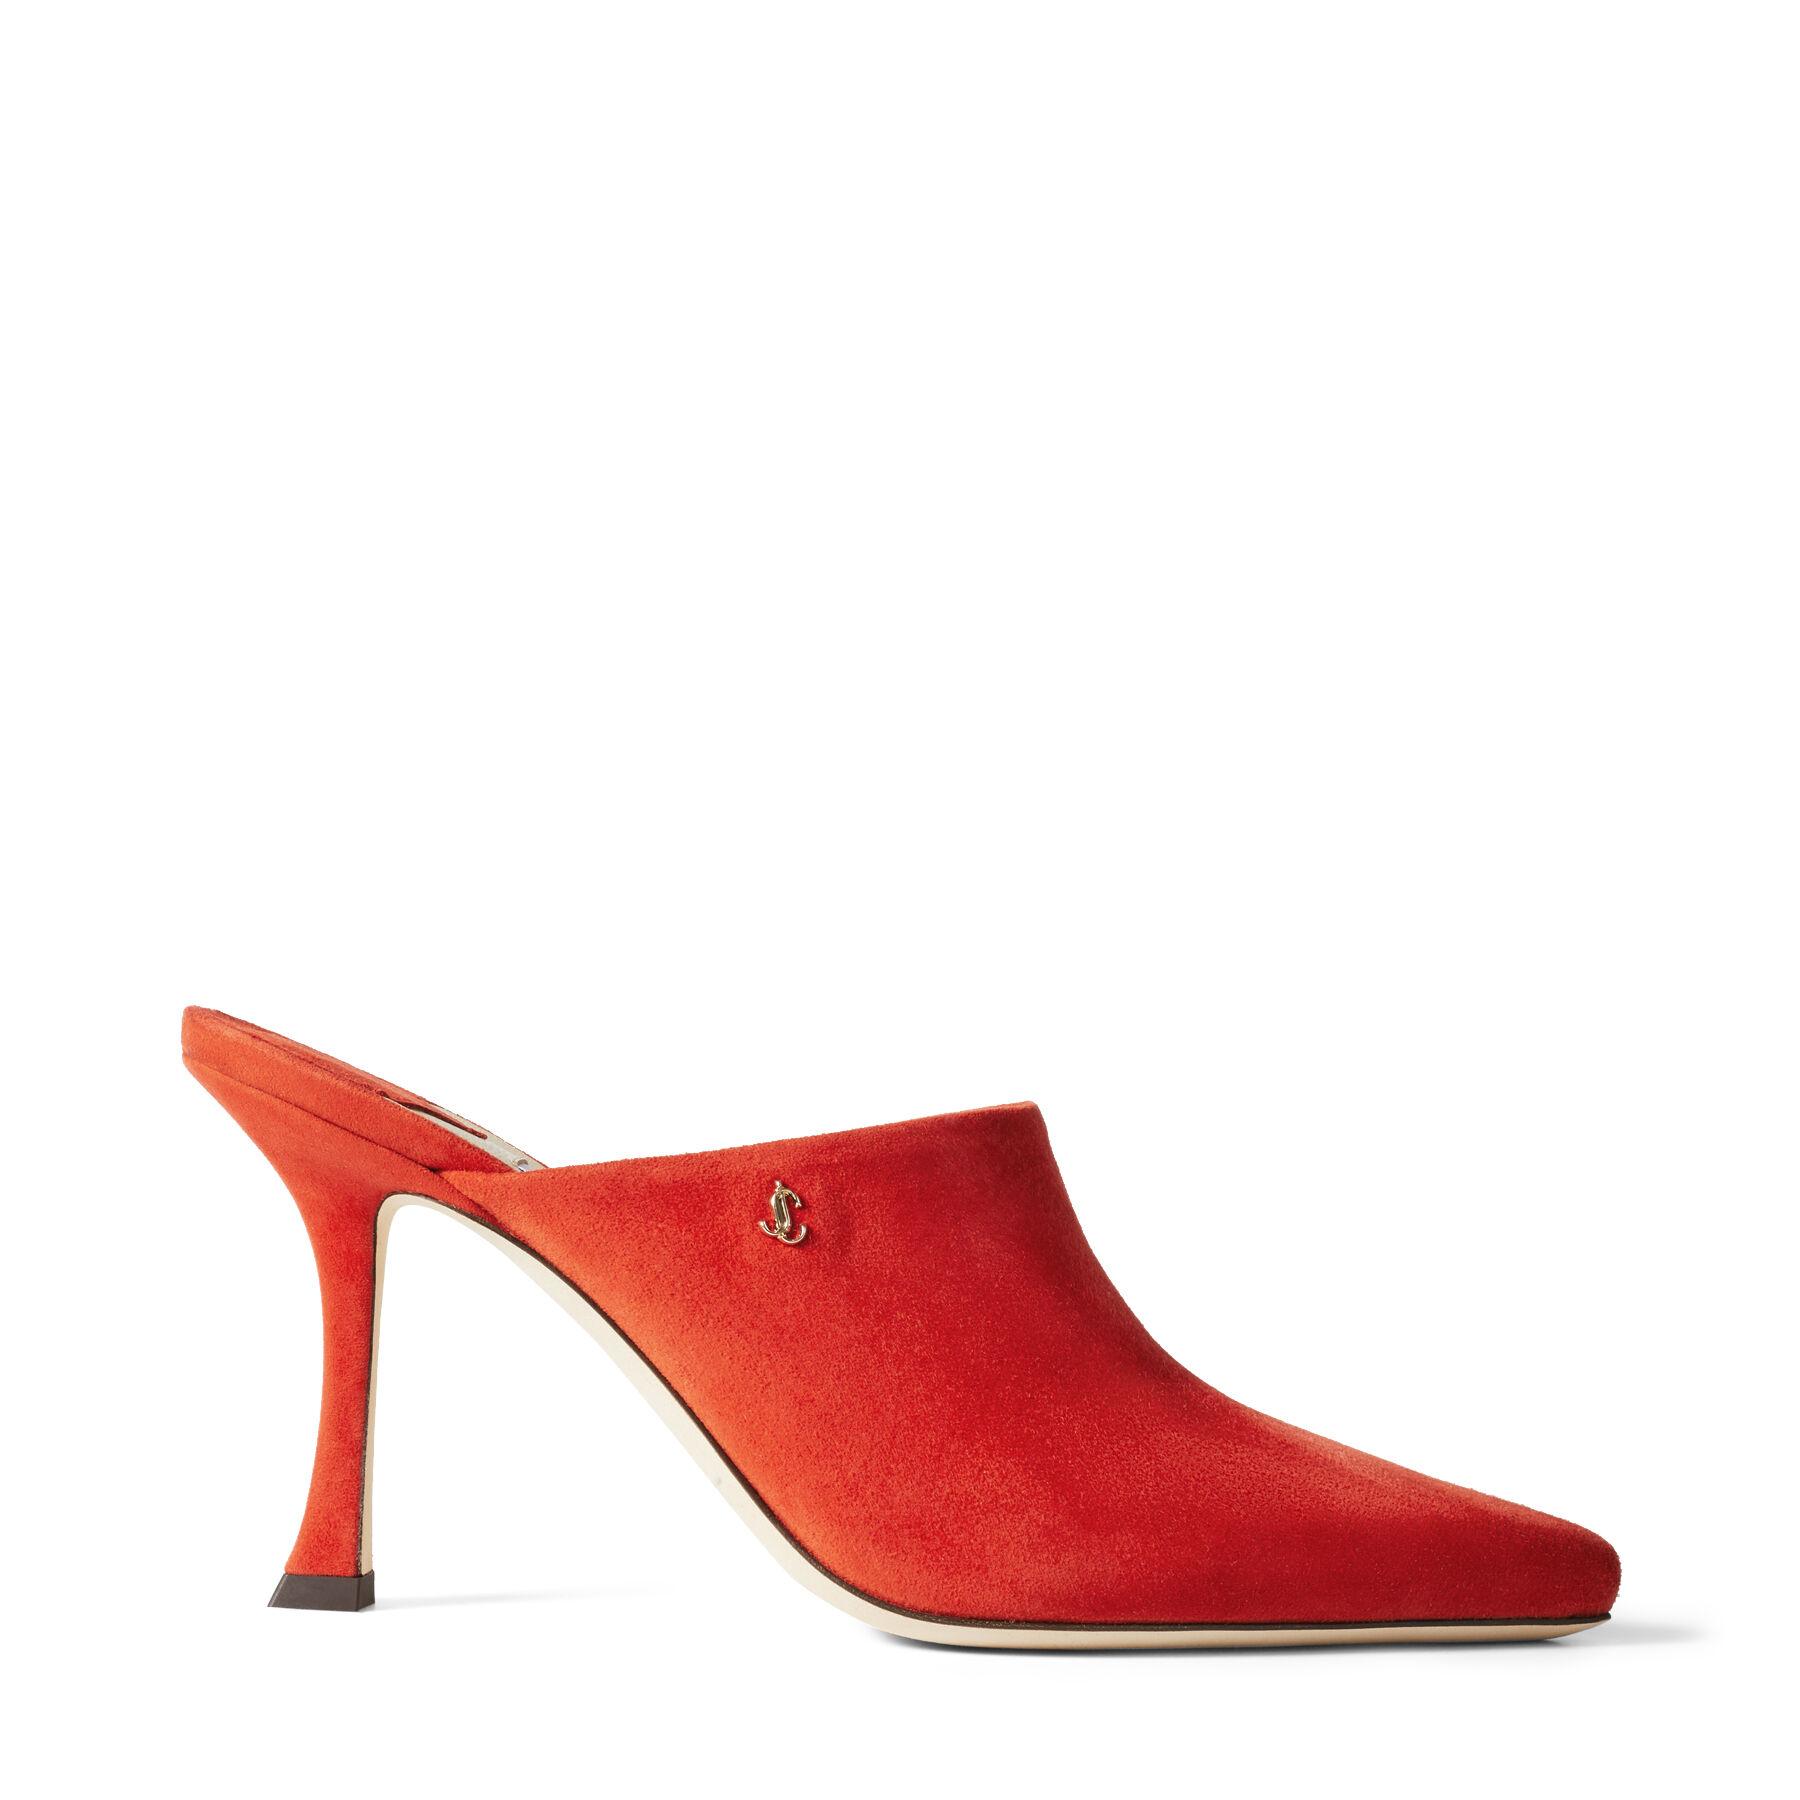 RYA 90 - Mandarin Red Suede Mules